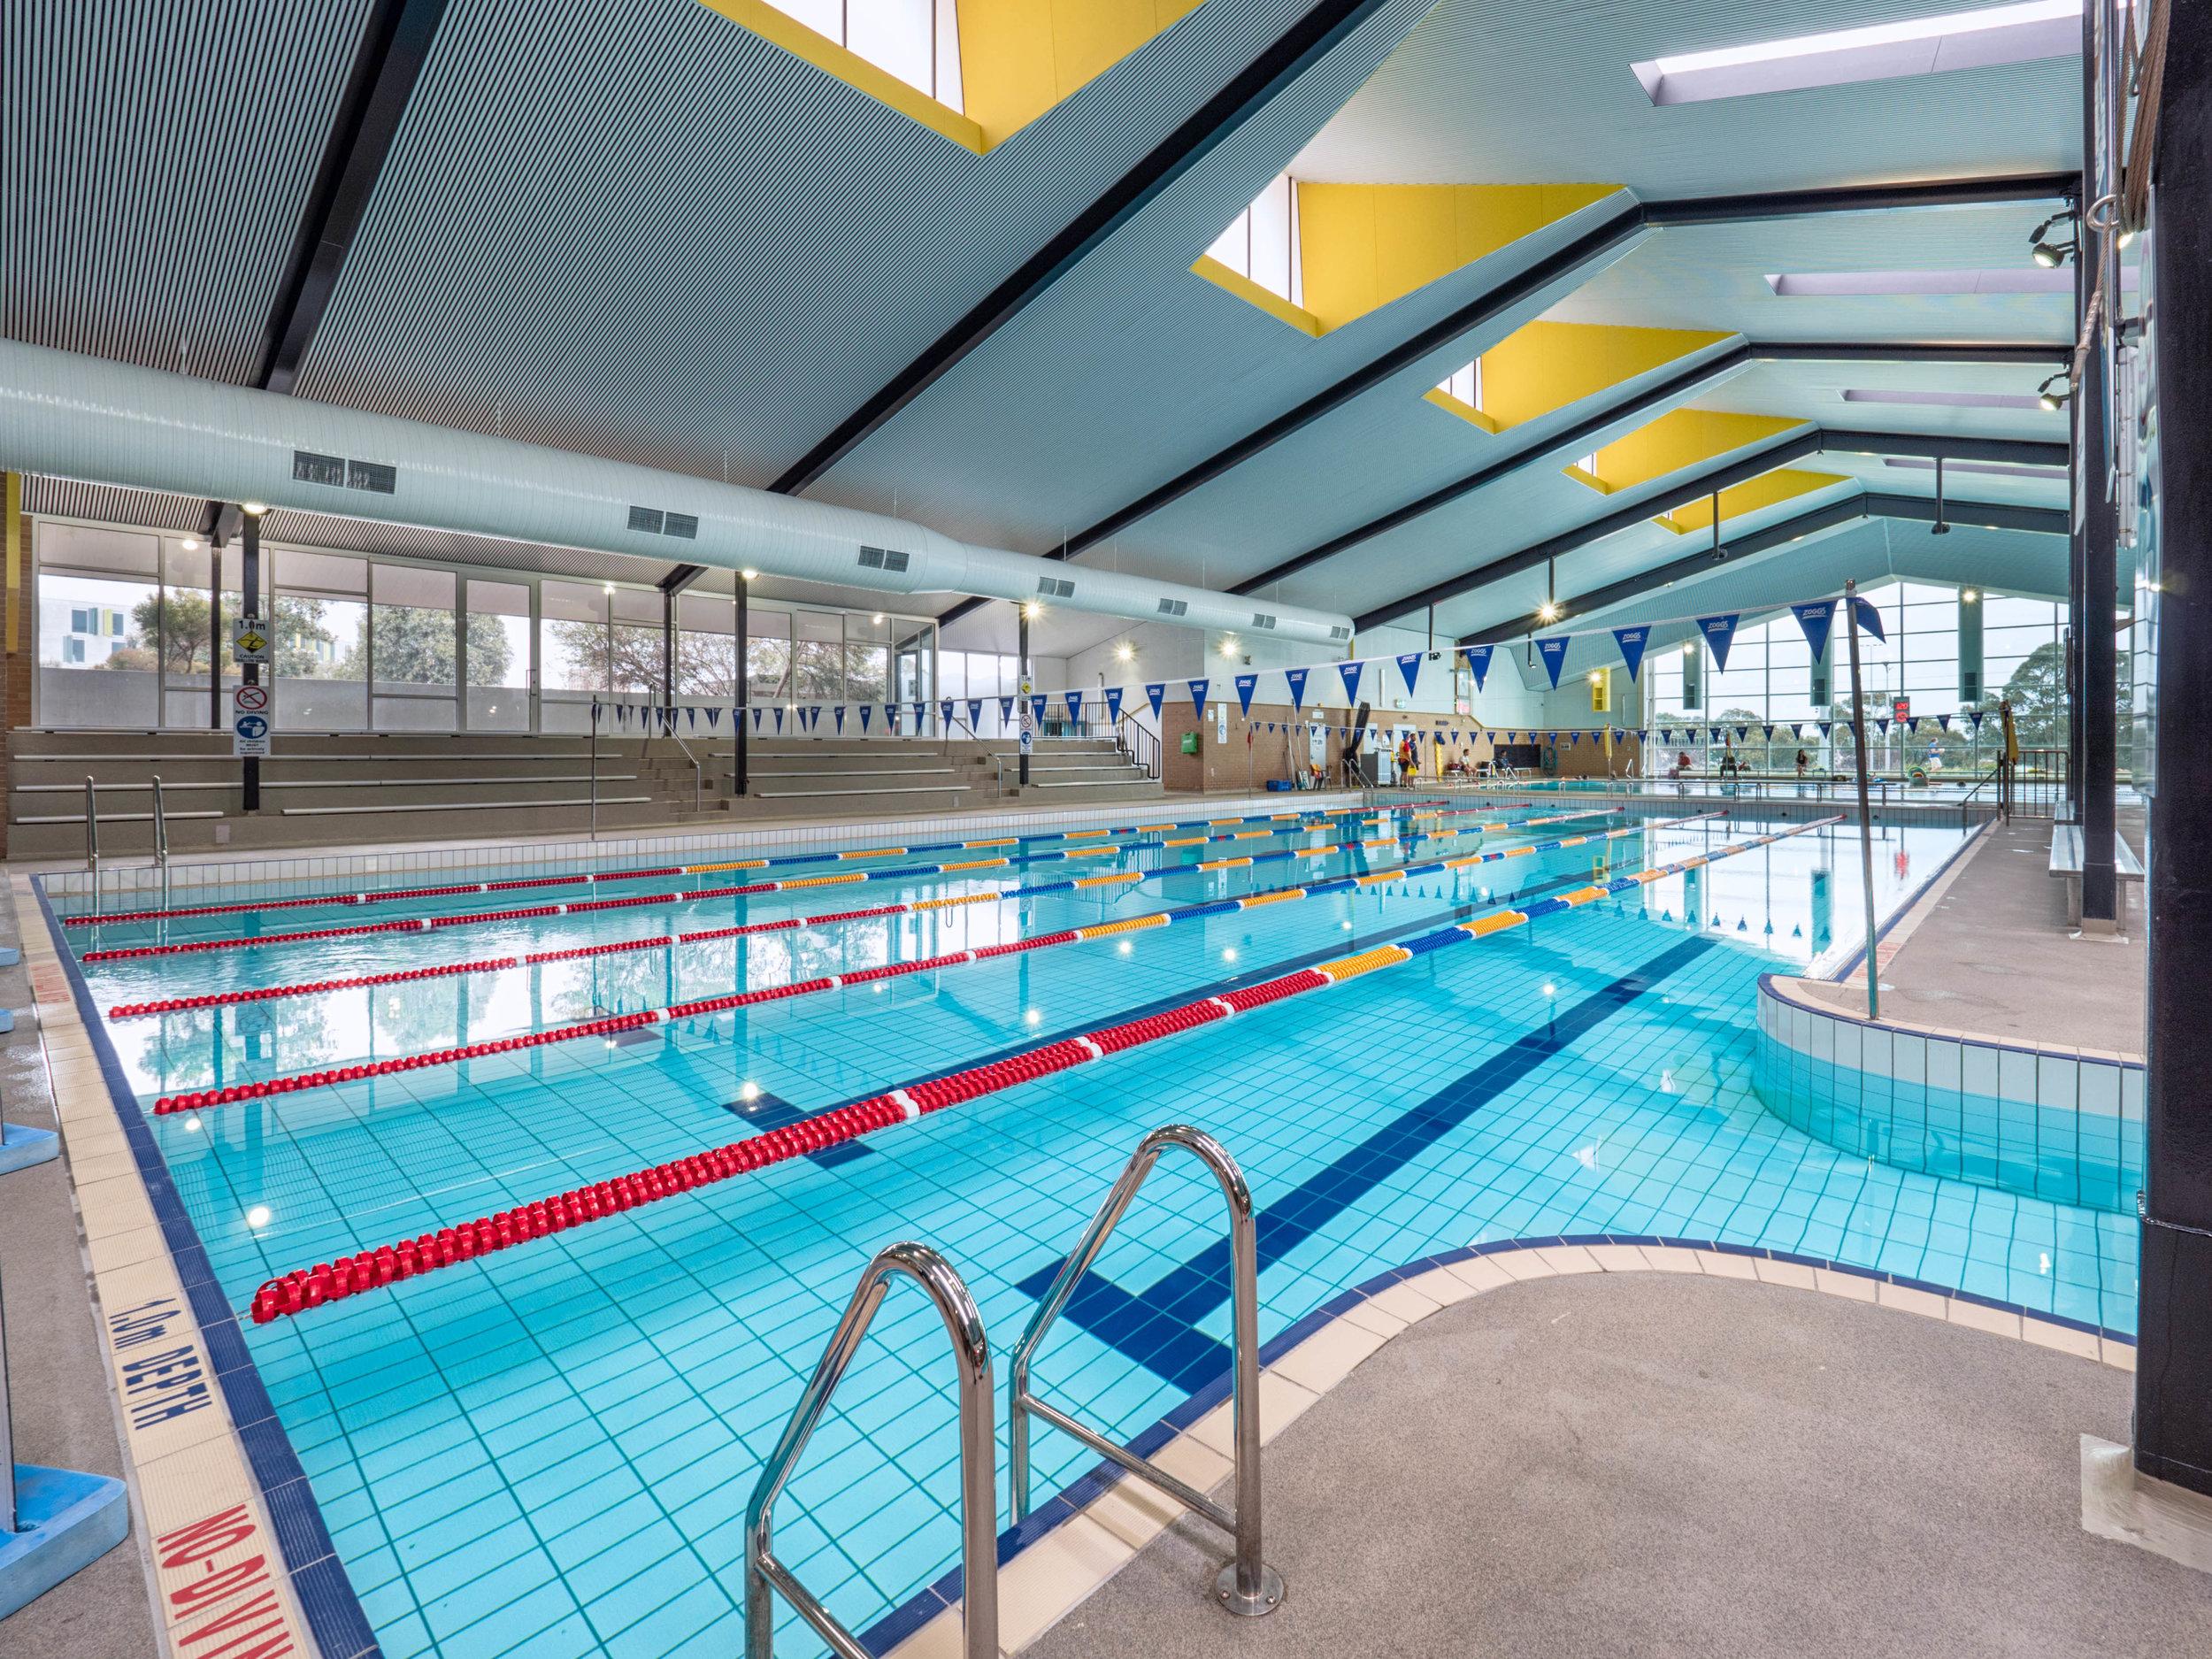 Monash Clayton Doug Ellis Swimming Pool_Resized 3.jpg